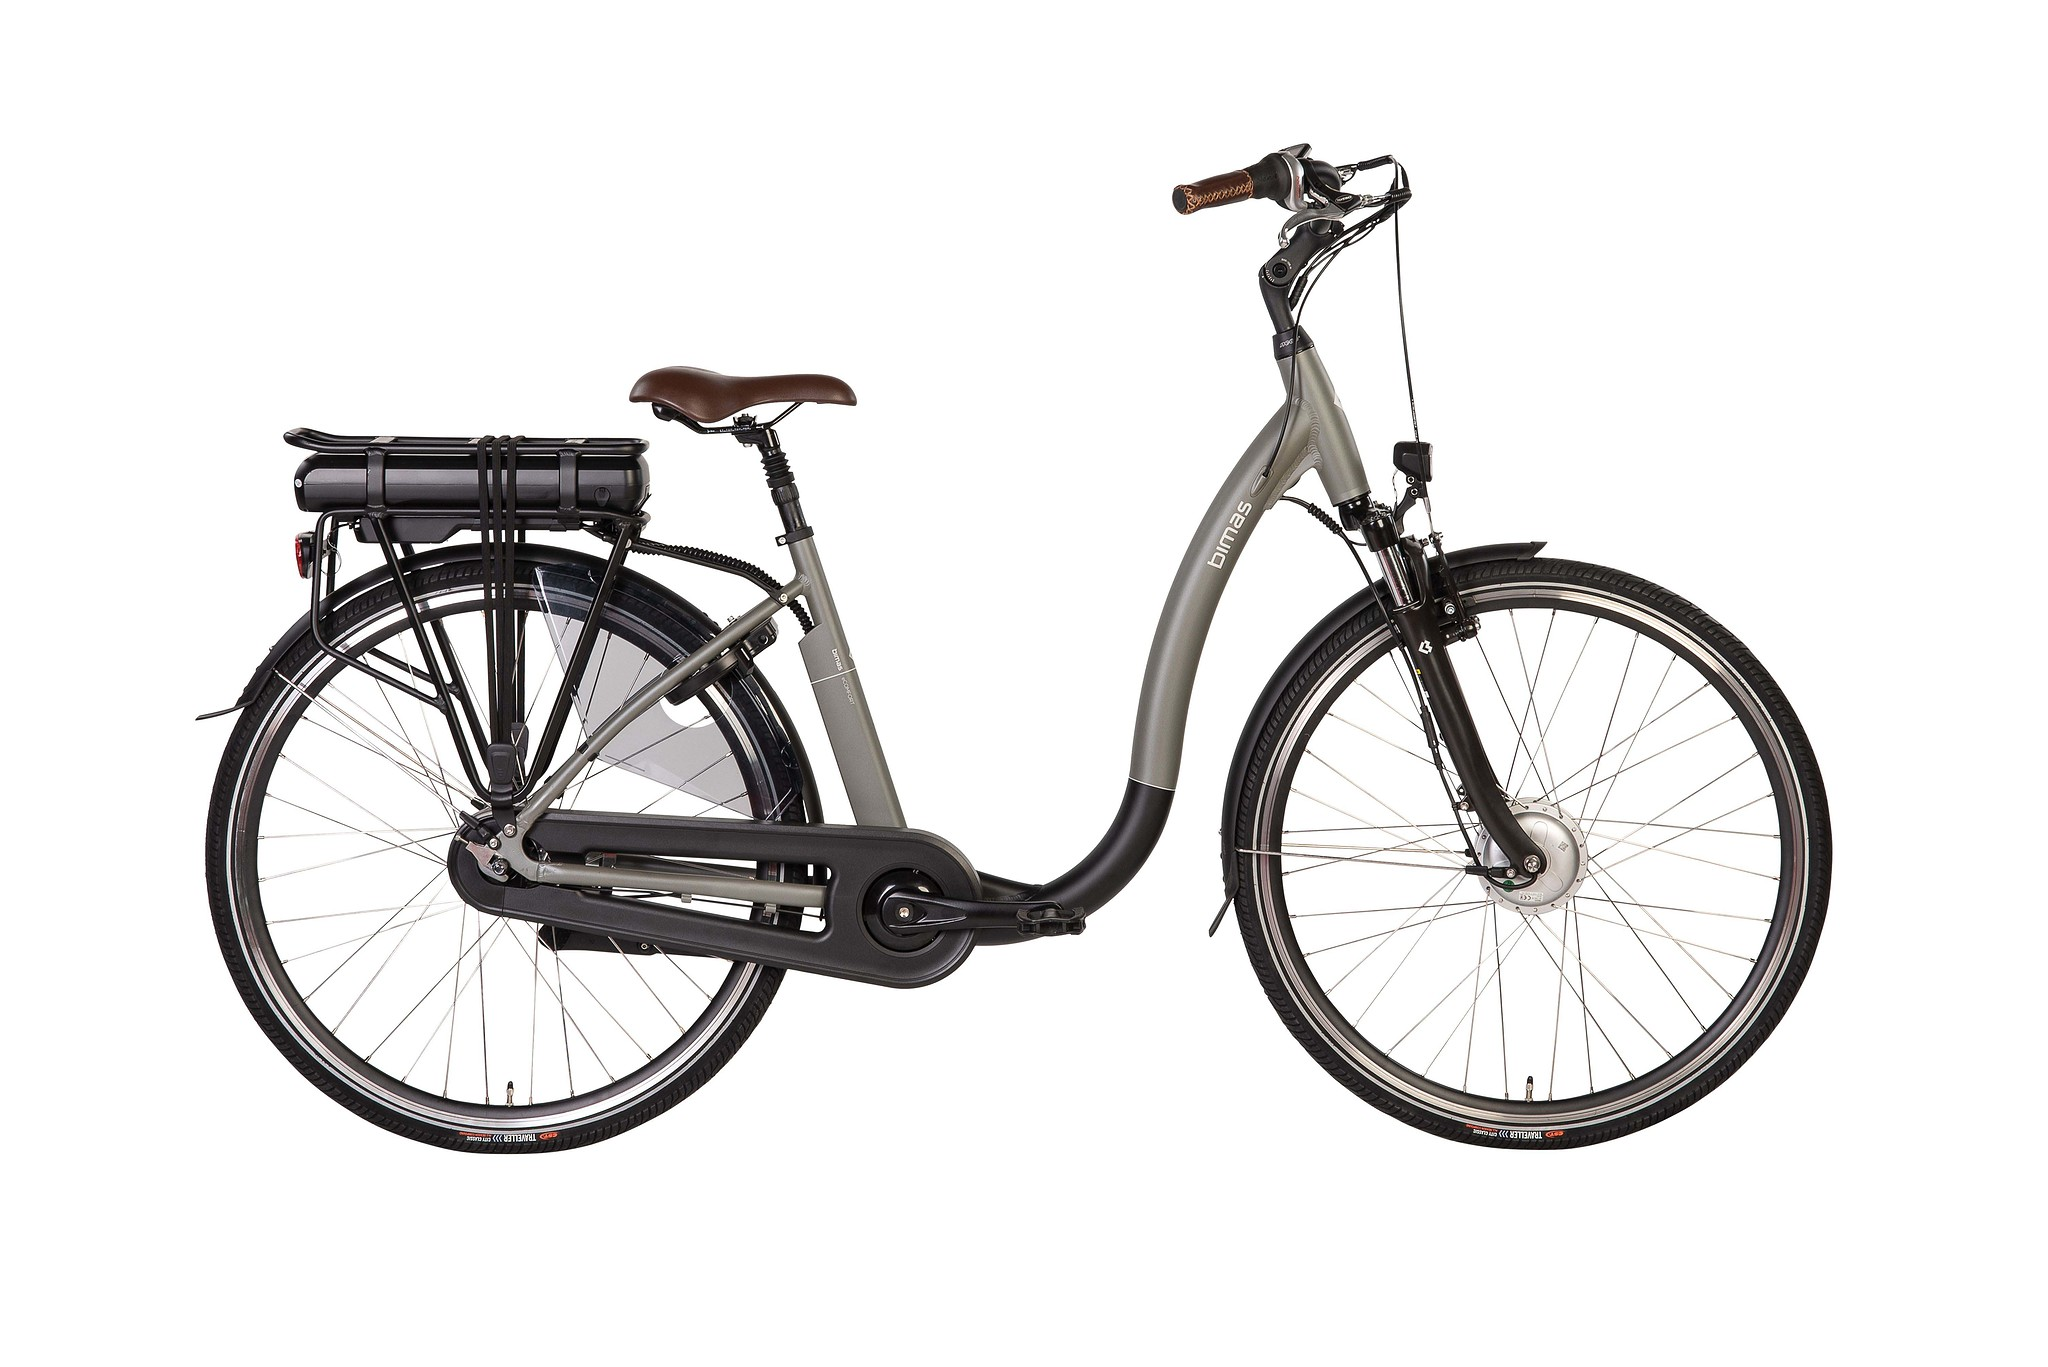 Bimas Elektrische fiets E-Comfort dames grijs 46cm 450 Watt Grijs